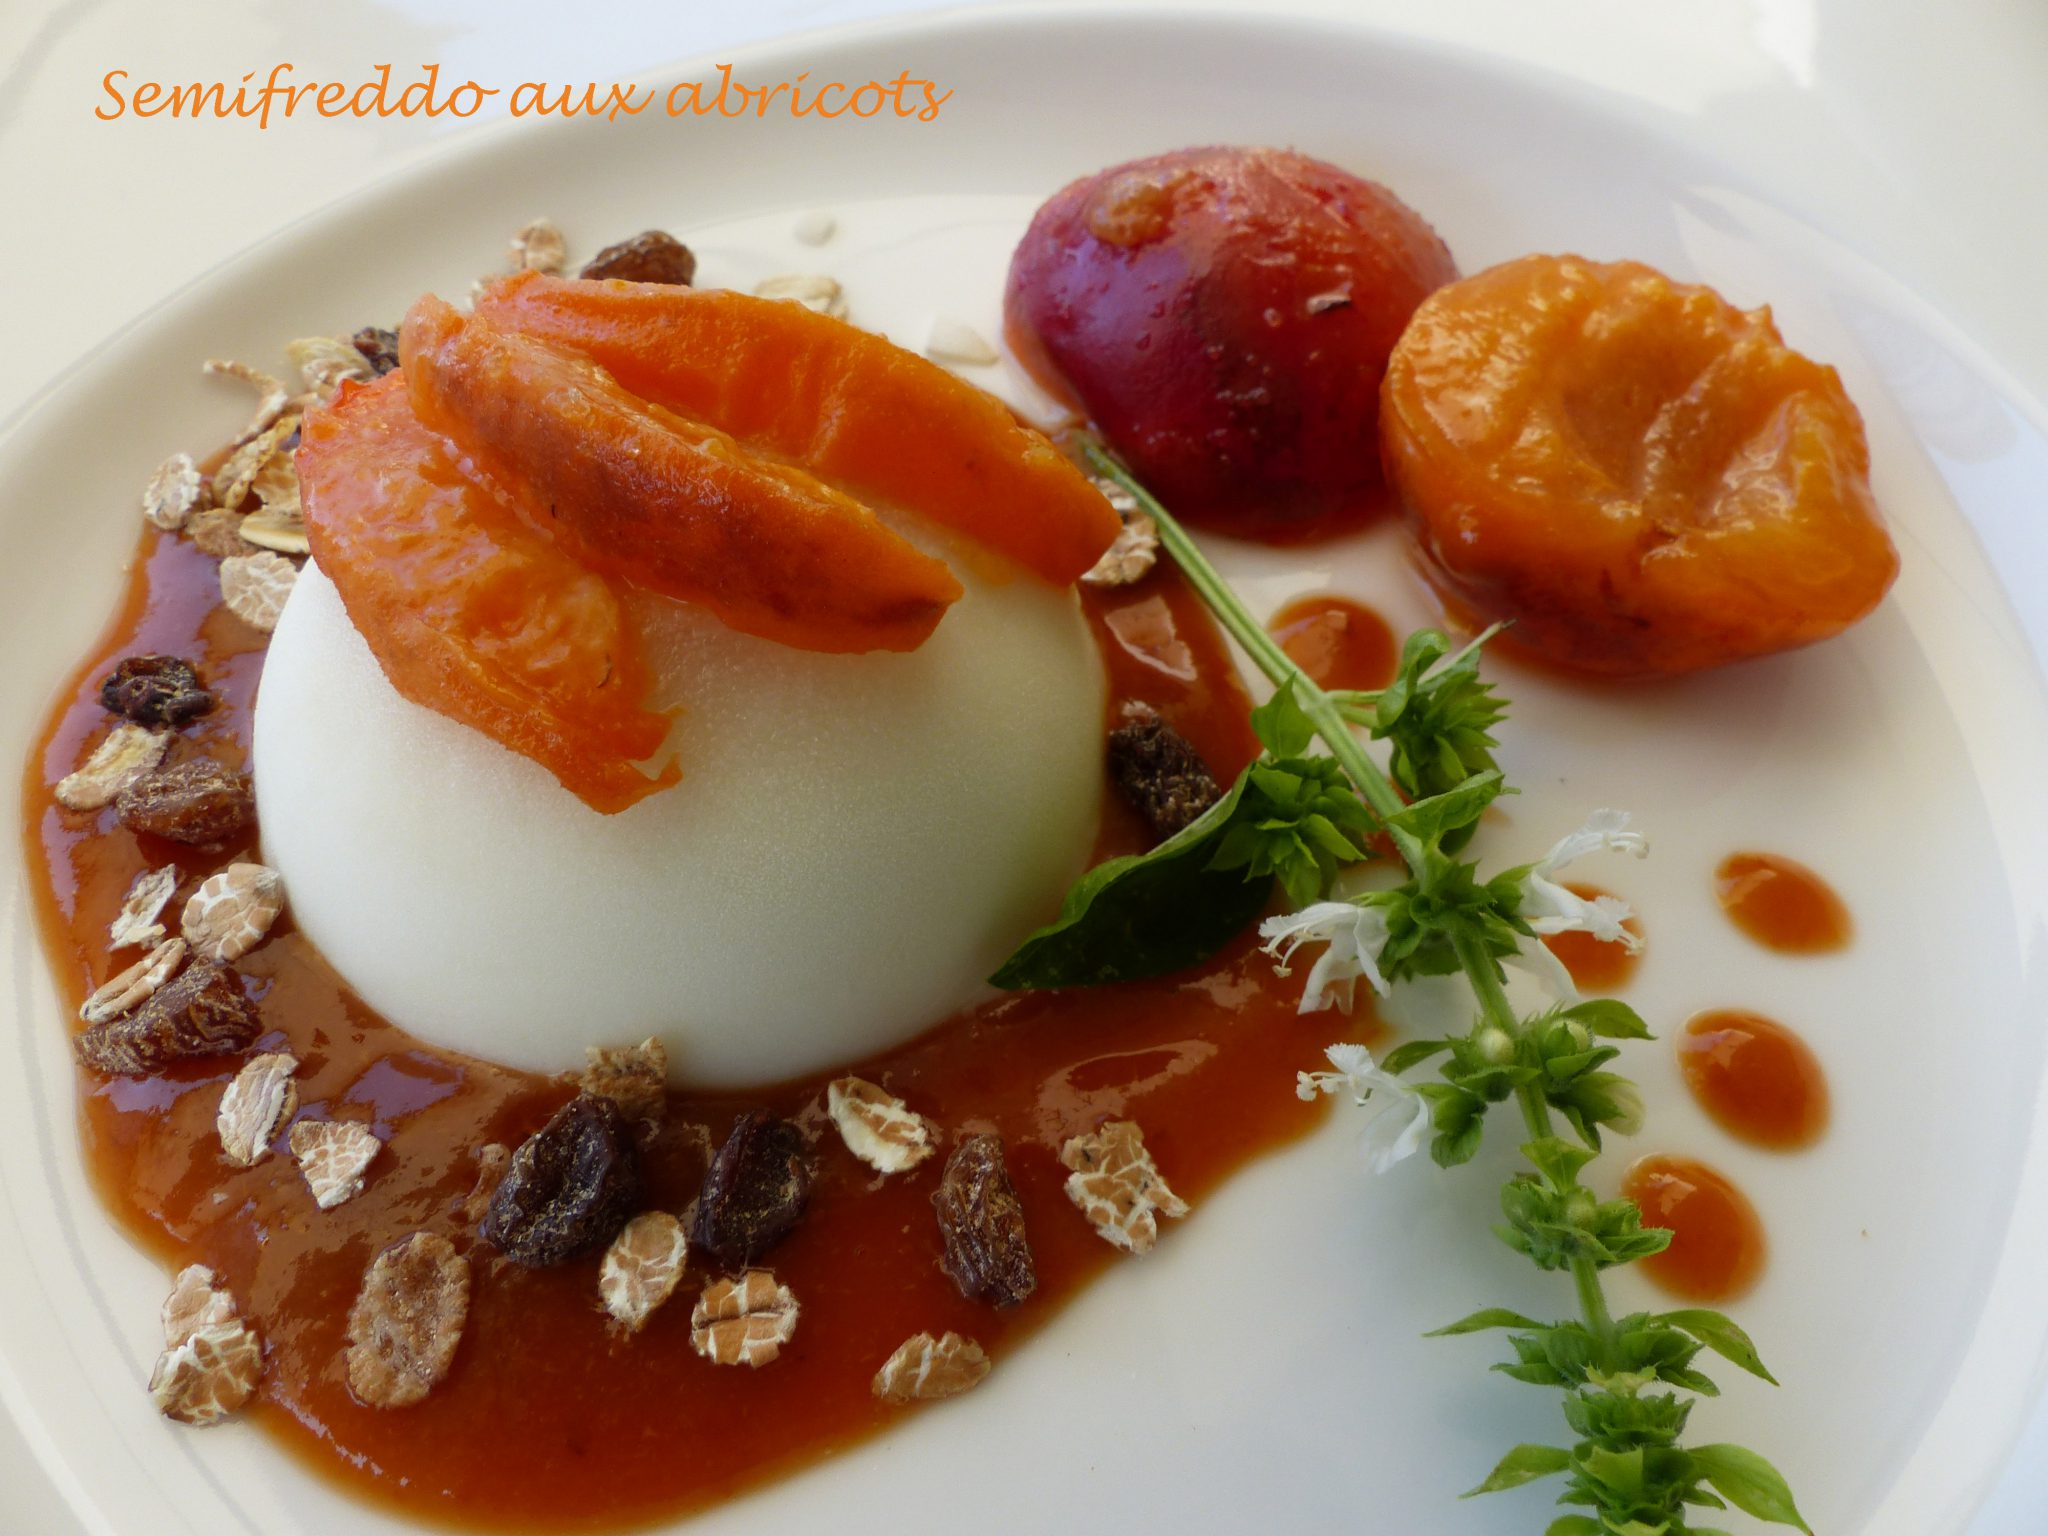 Semifreddo aux abricots P1120116 R